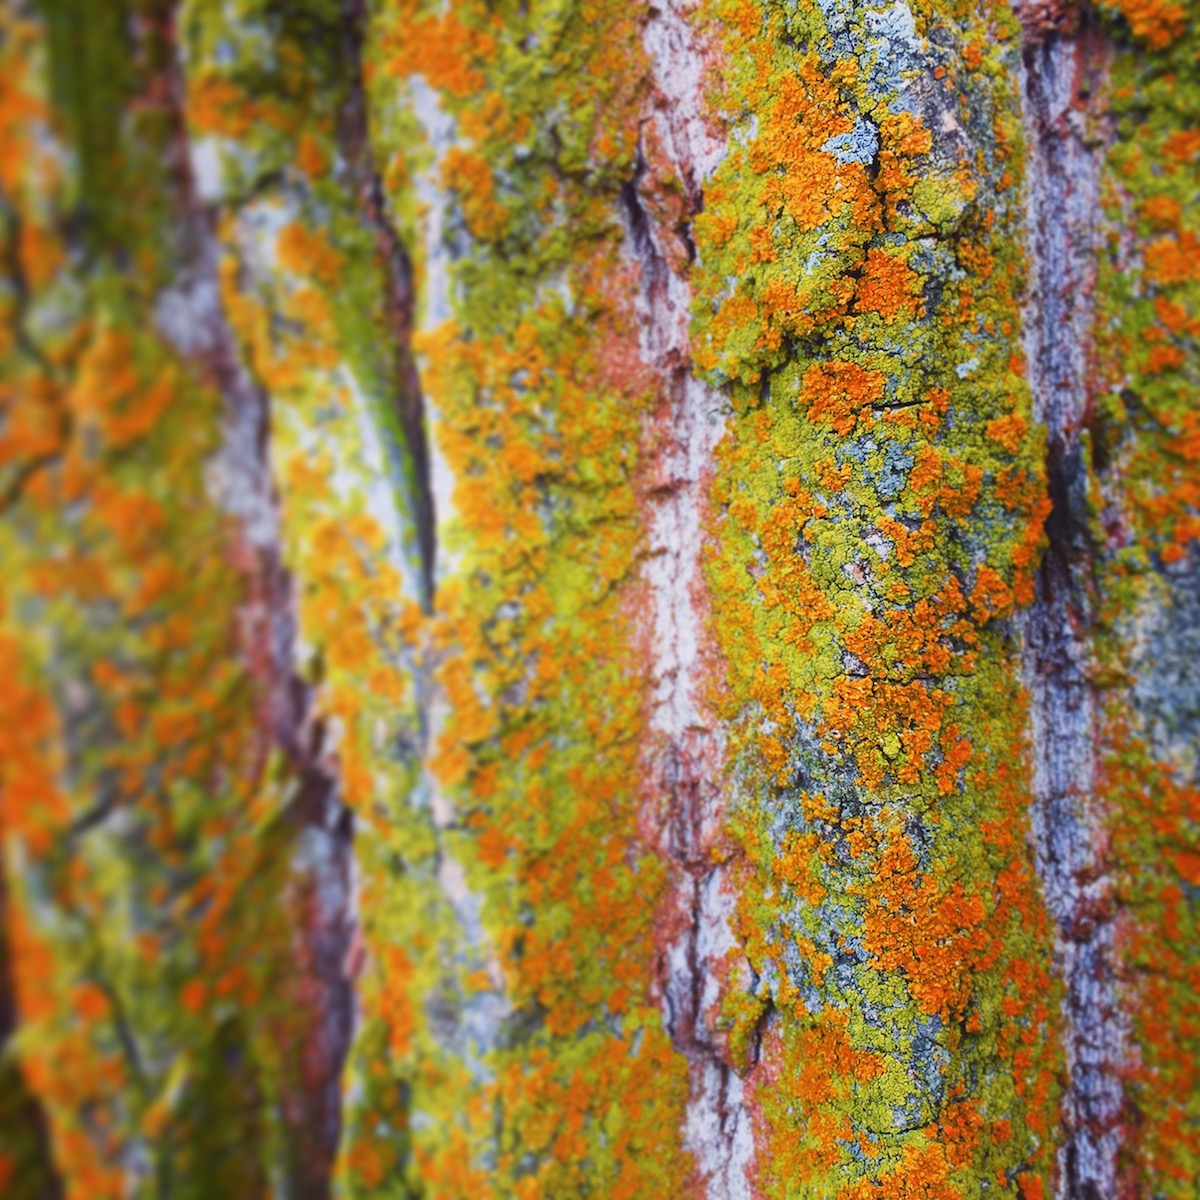 moss on birch trees close up